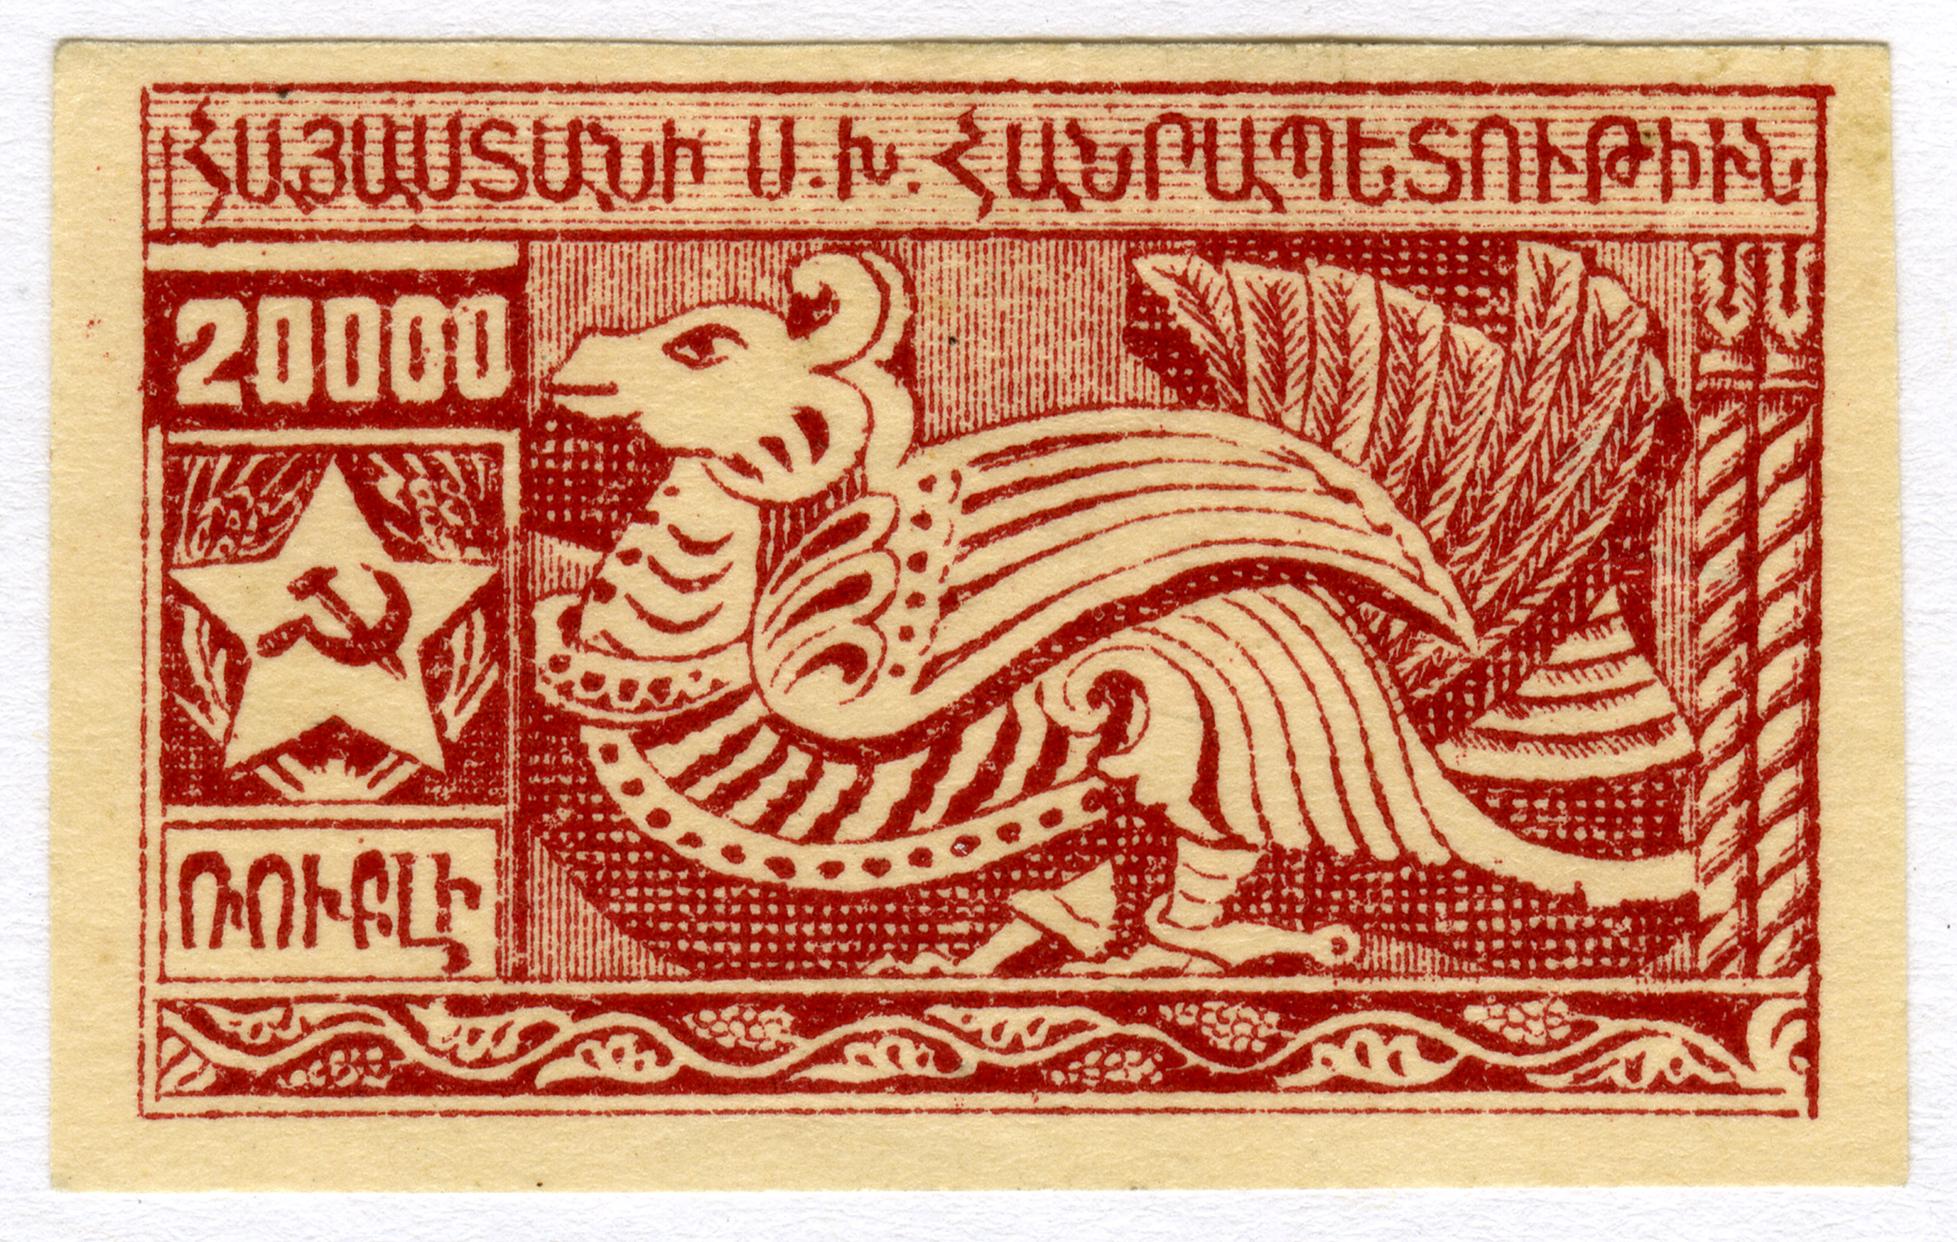 http://www.peopleofar.com/wp-content/uploads/soviet-armenian-stamp3.jpg